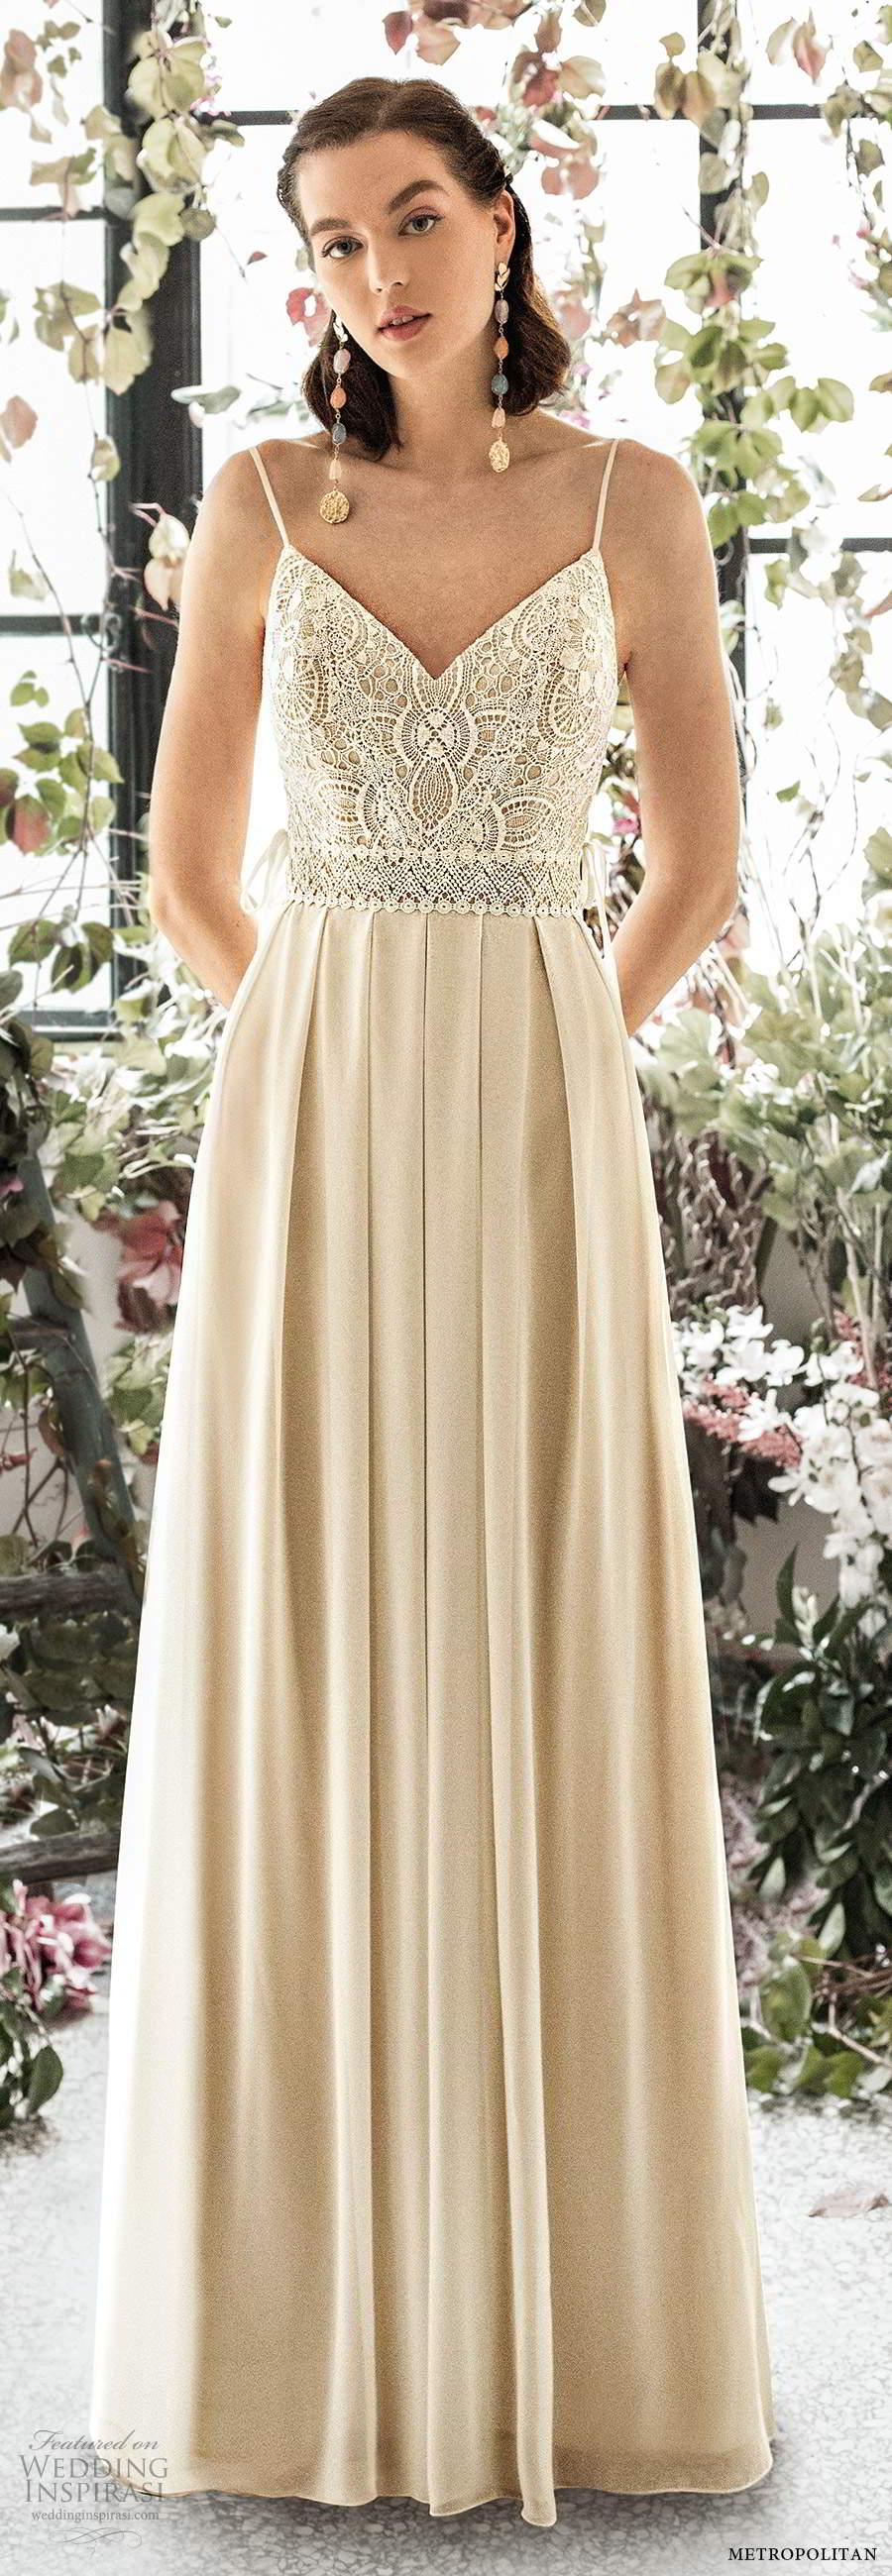 metropolitan spring 2020 bridal sleeveless thin straps v neckline embellished lace bodice pleated skirt a line wedding dress scoop back chapel train (10) mv